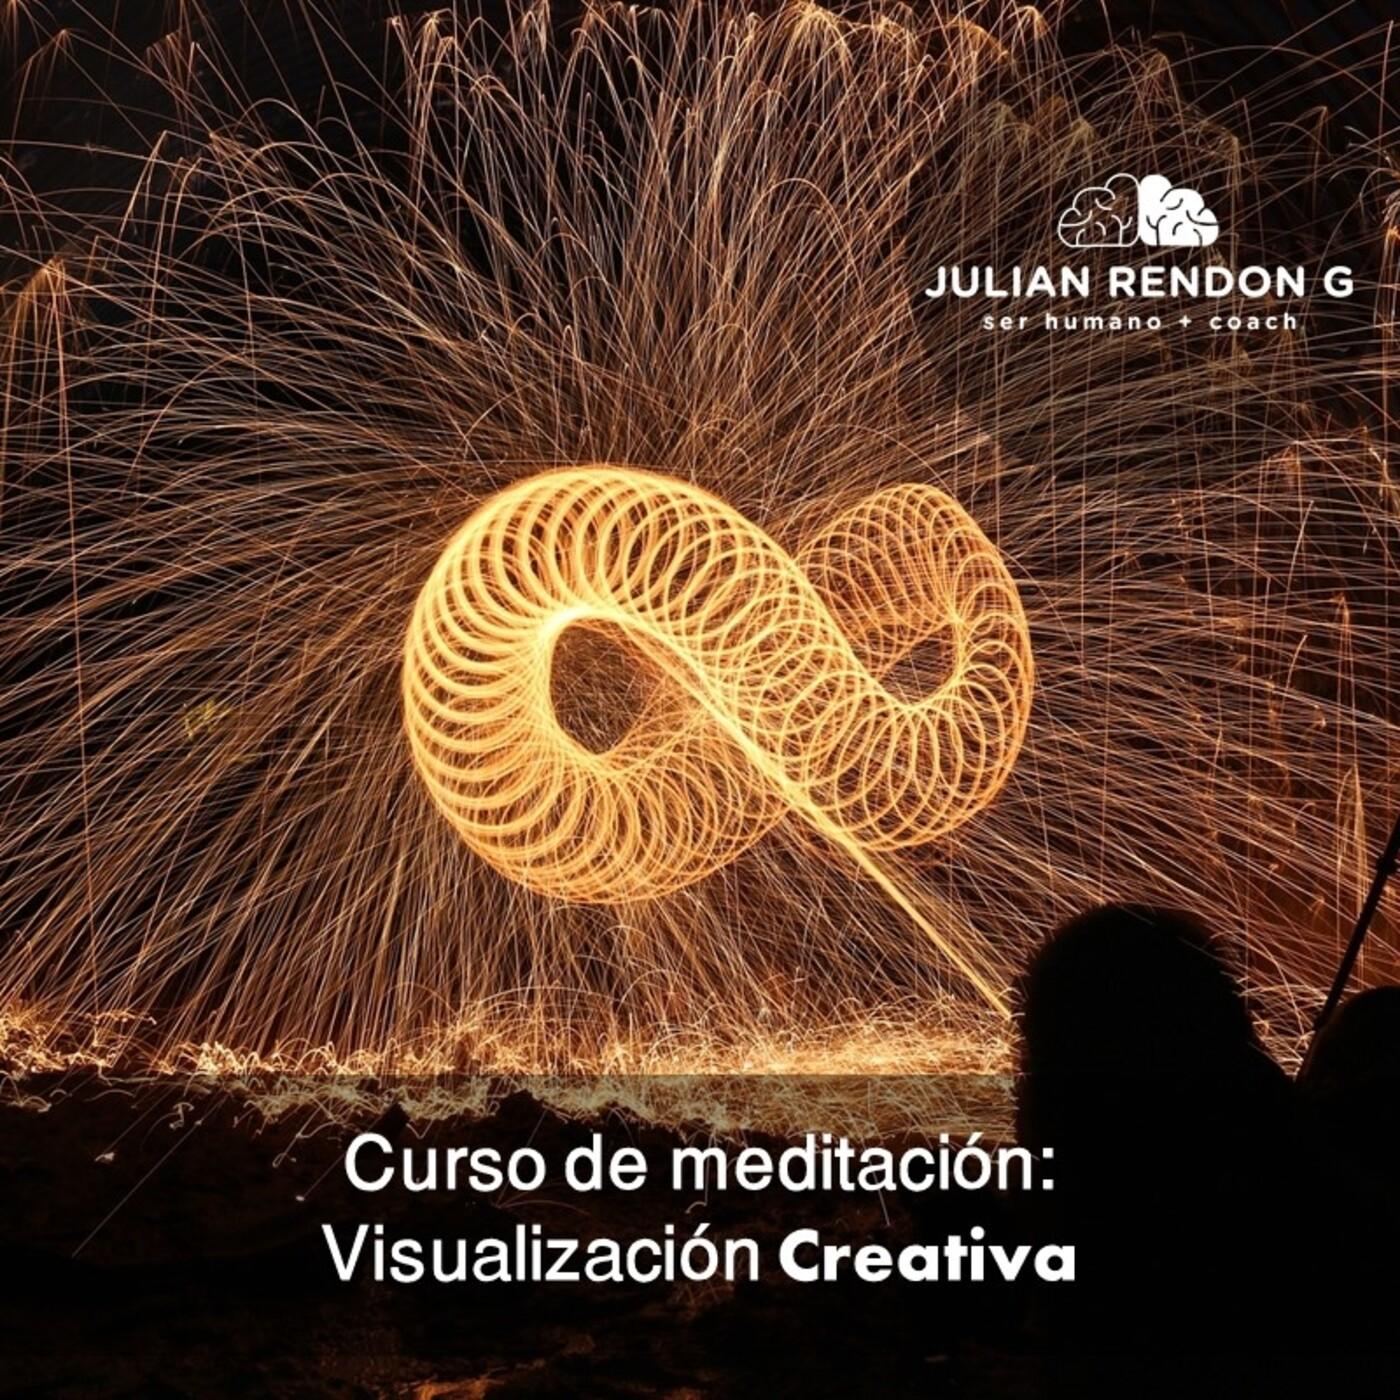 Meditación: Visualización Creativa